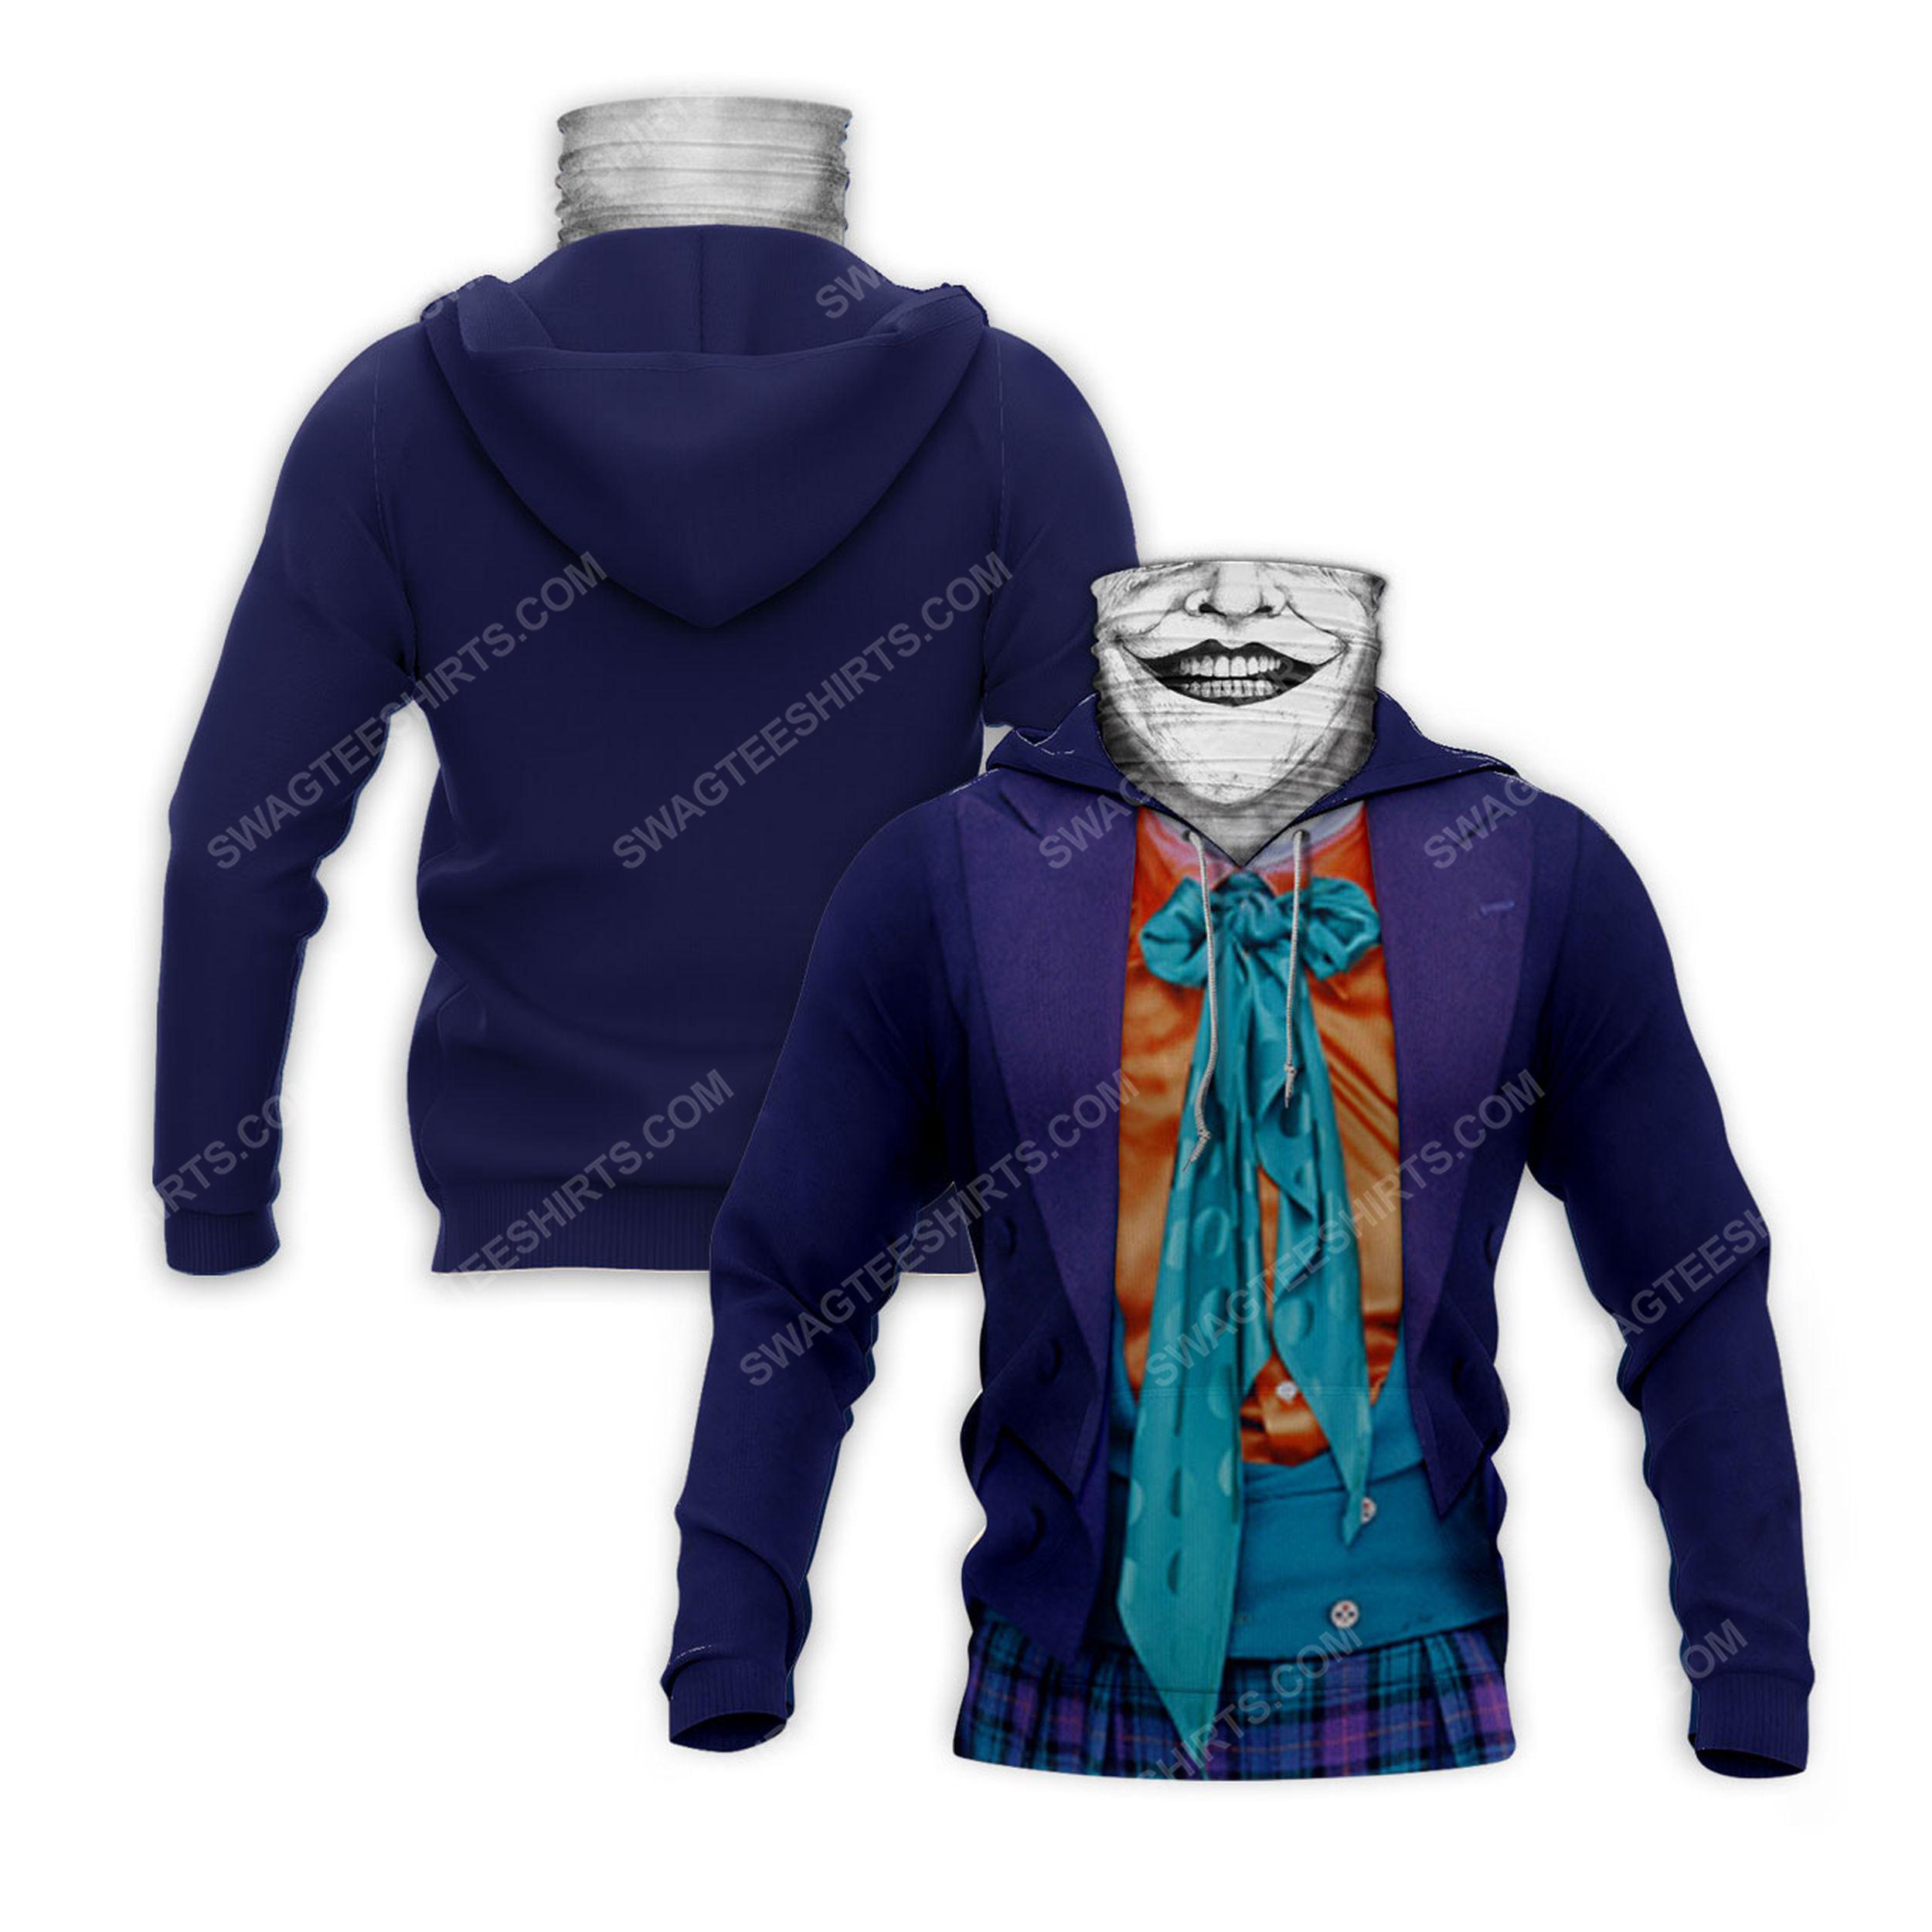 Horror movie joker for halloween full print mask hoodie 2(1) - Copy